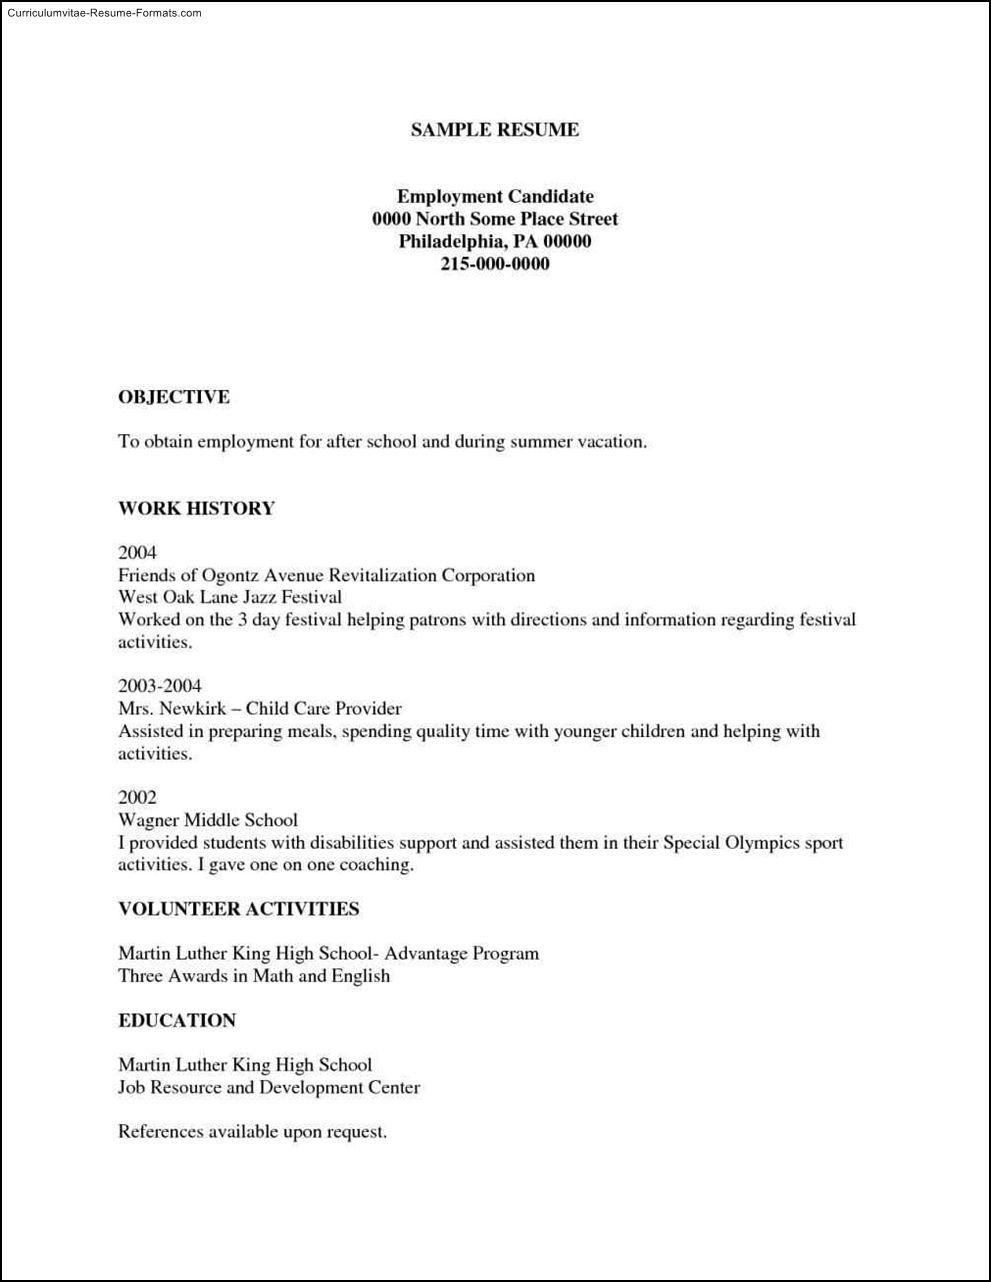 Free Printable Resumes Templates Free Samples Examples Format Resume - Free Printable Professional Resume Templates